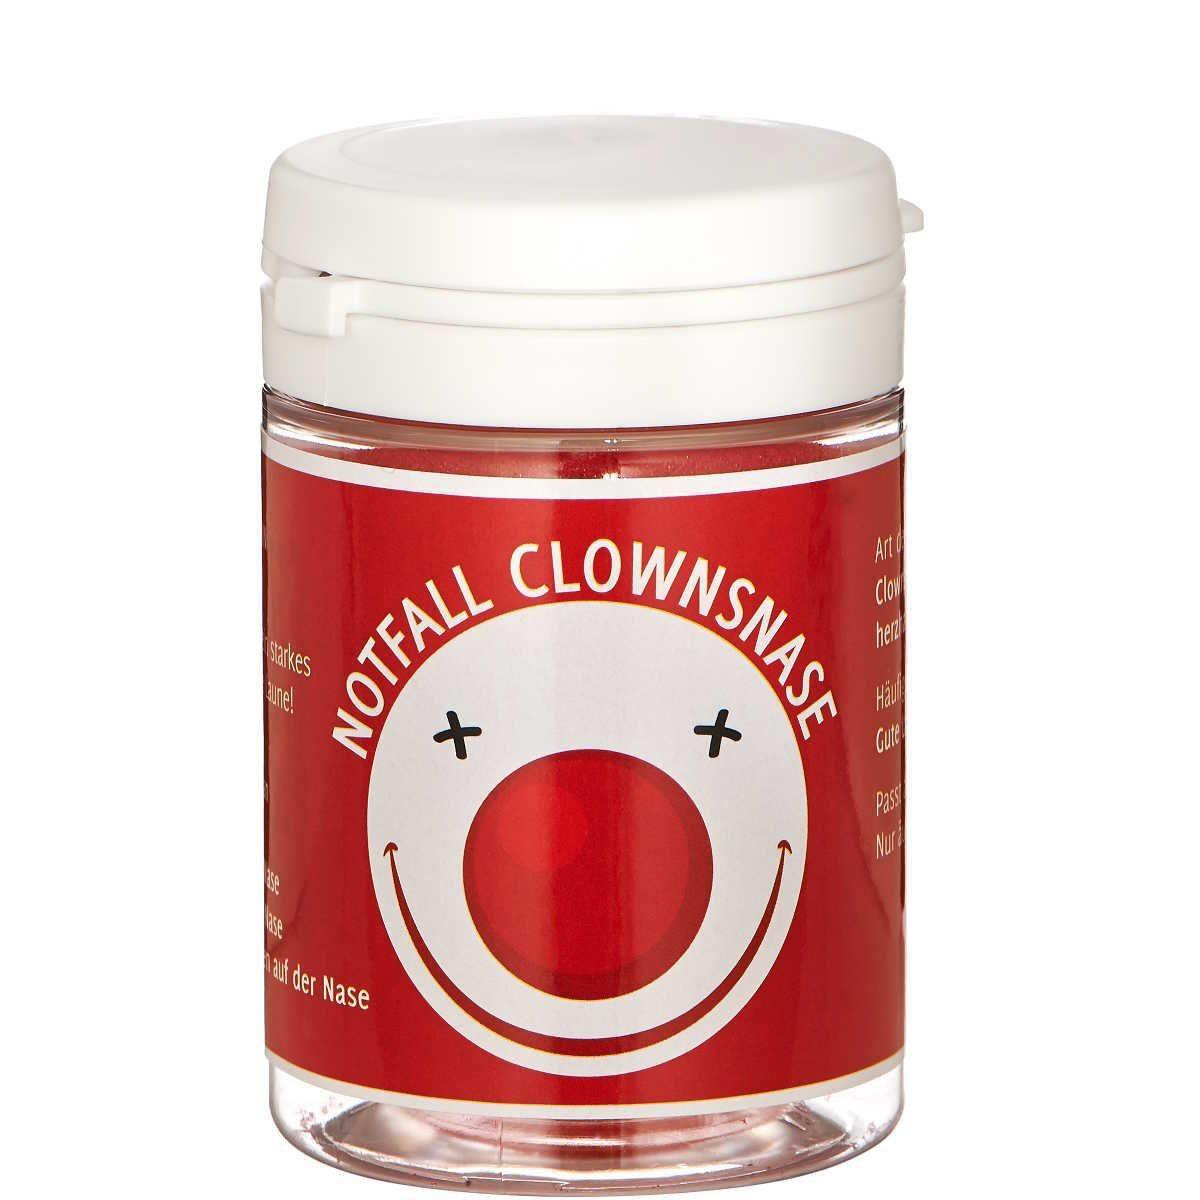 BUTLERS FIRST AID »Notfall Clownsnase«